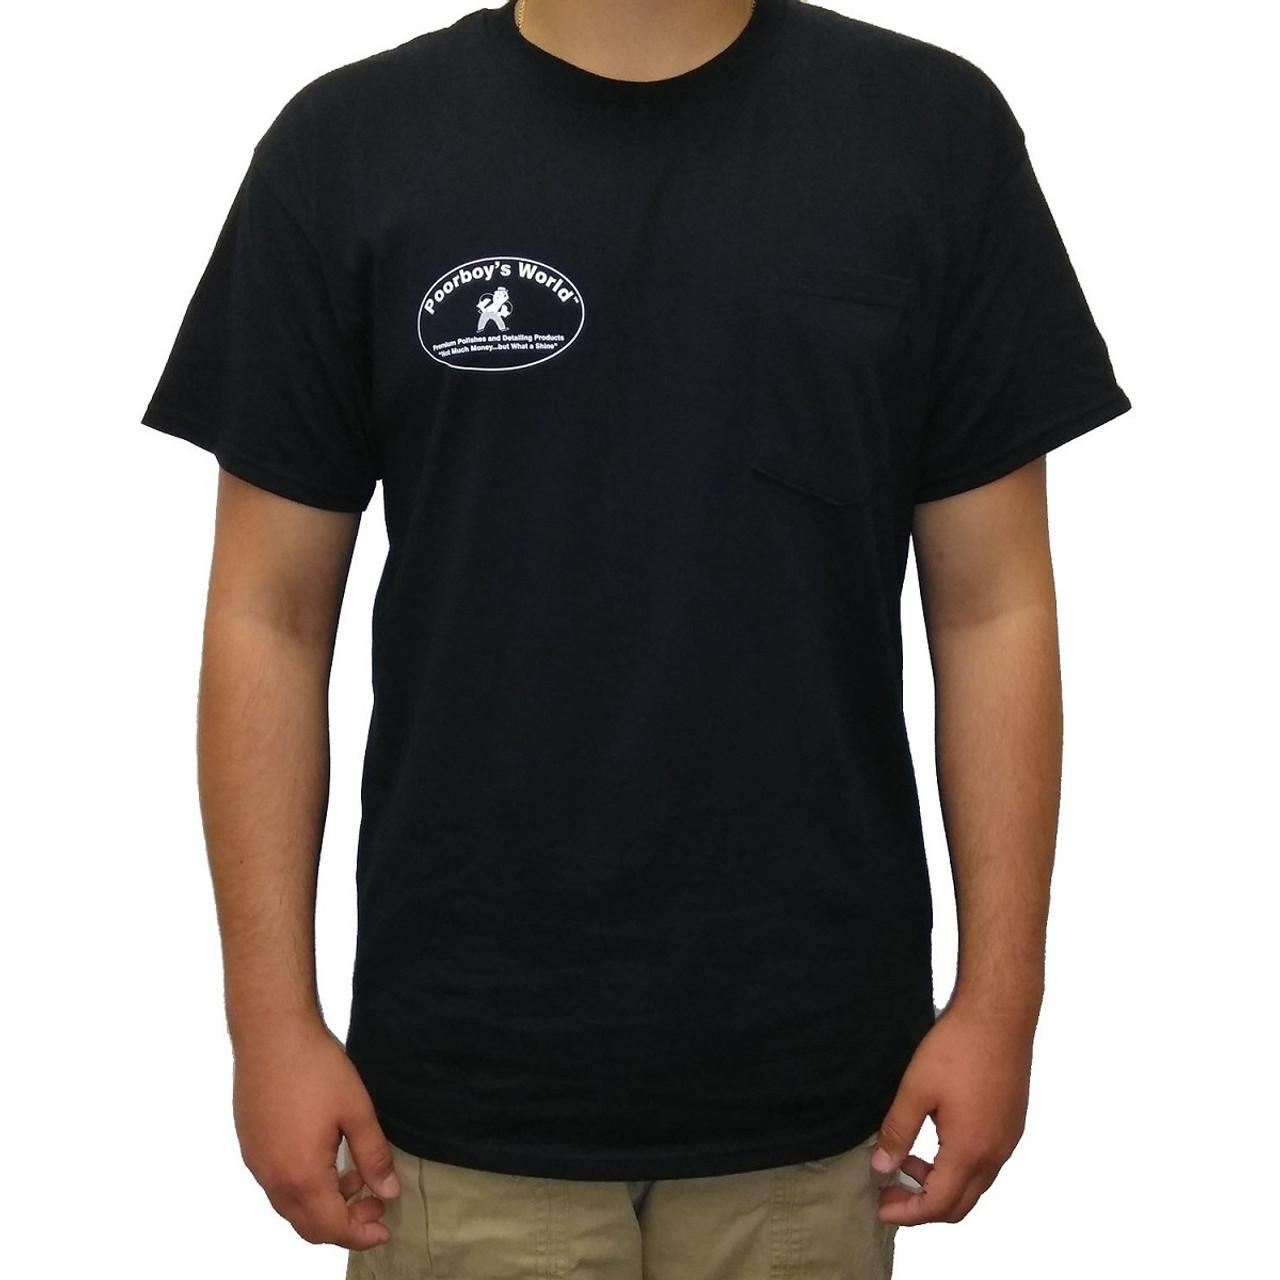 Poorboy's World Black T-Shirt w/ Pocket - Medium - Front